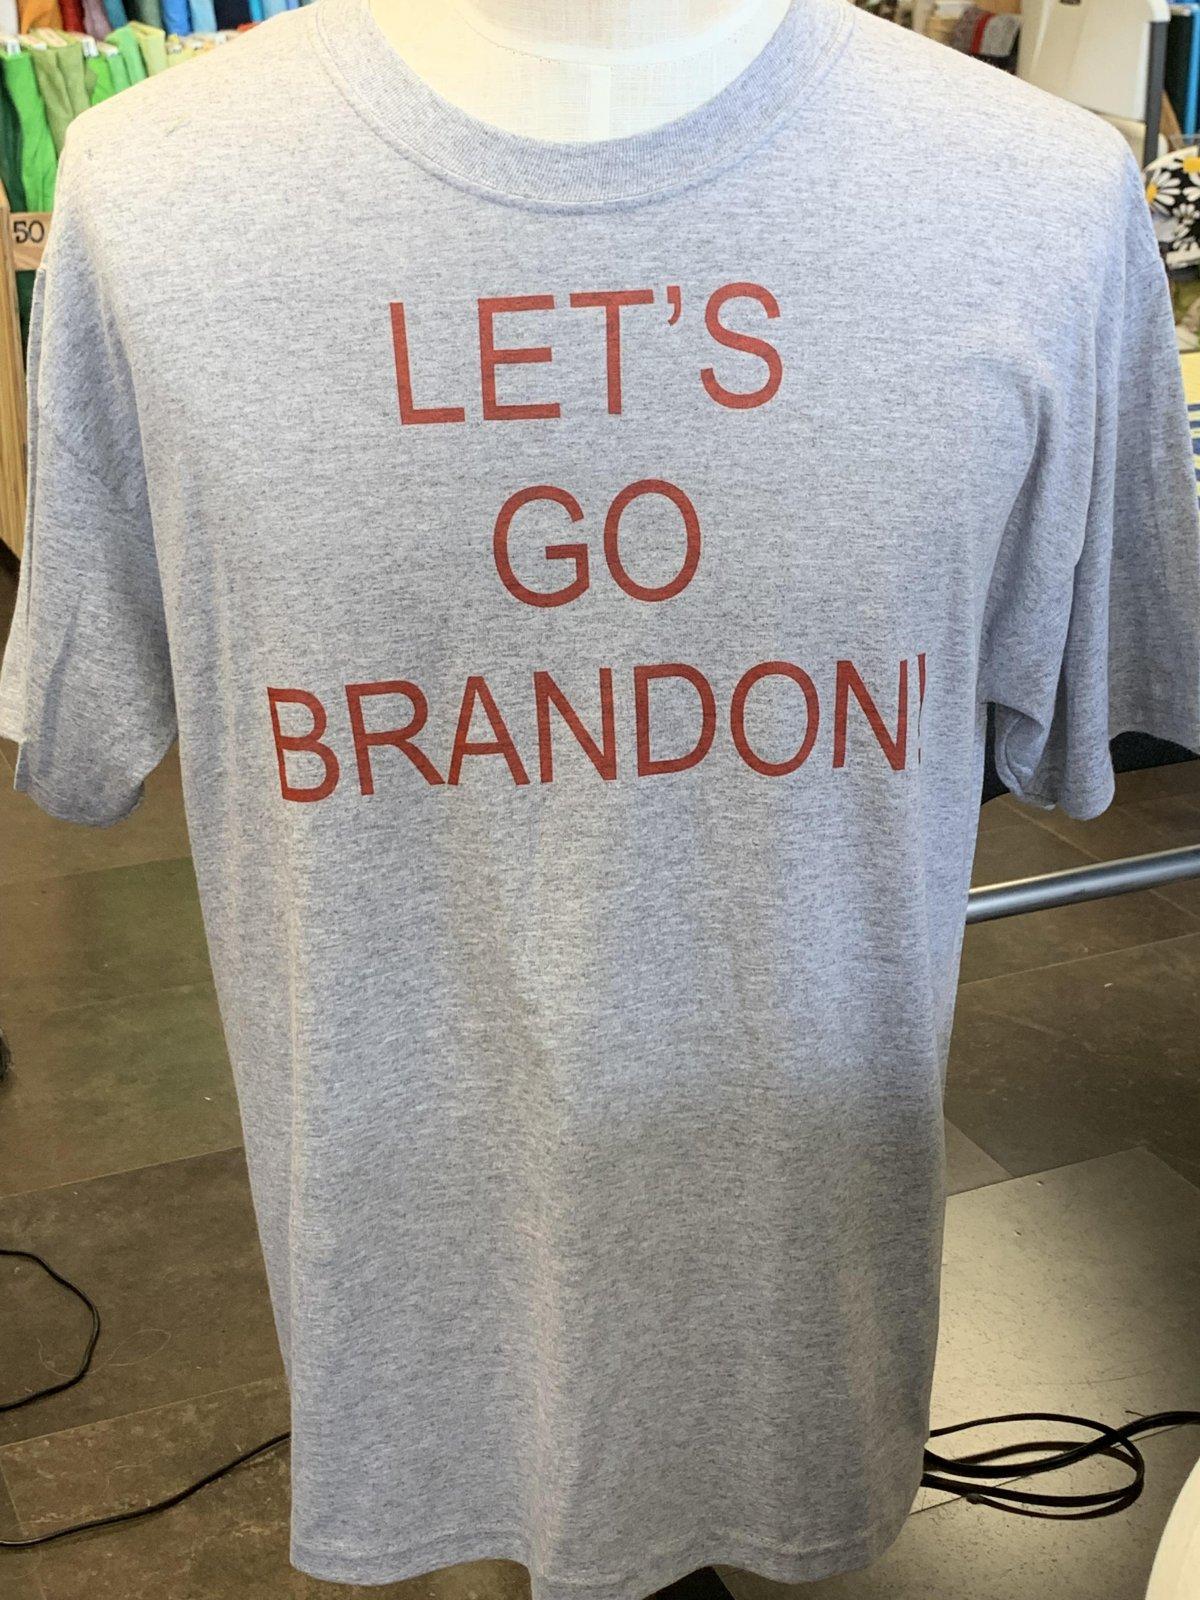 Lets go Brandon T-shirt